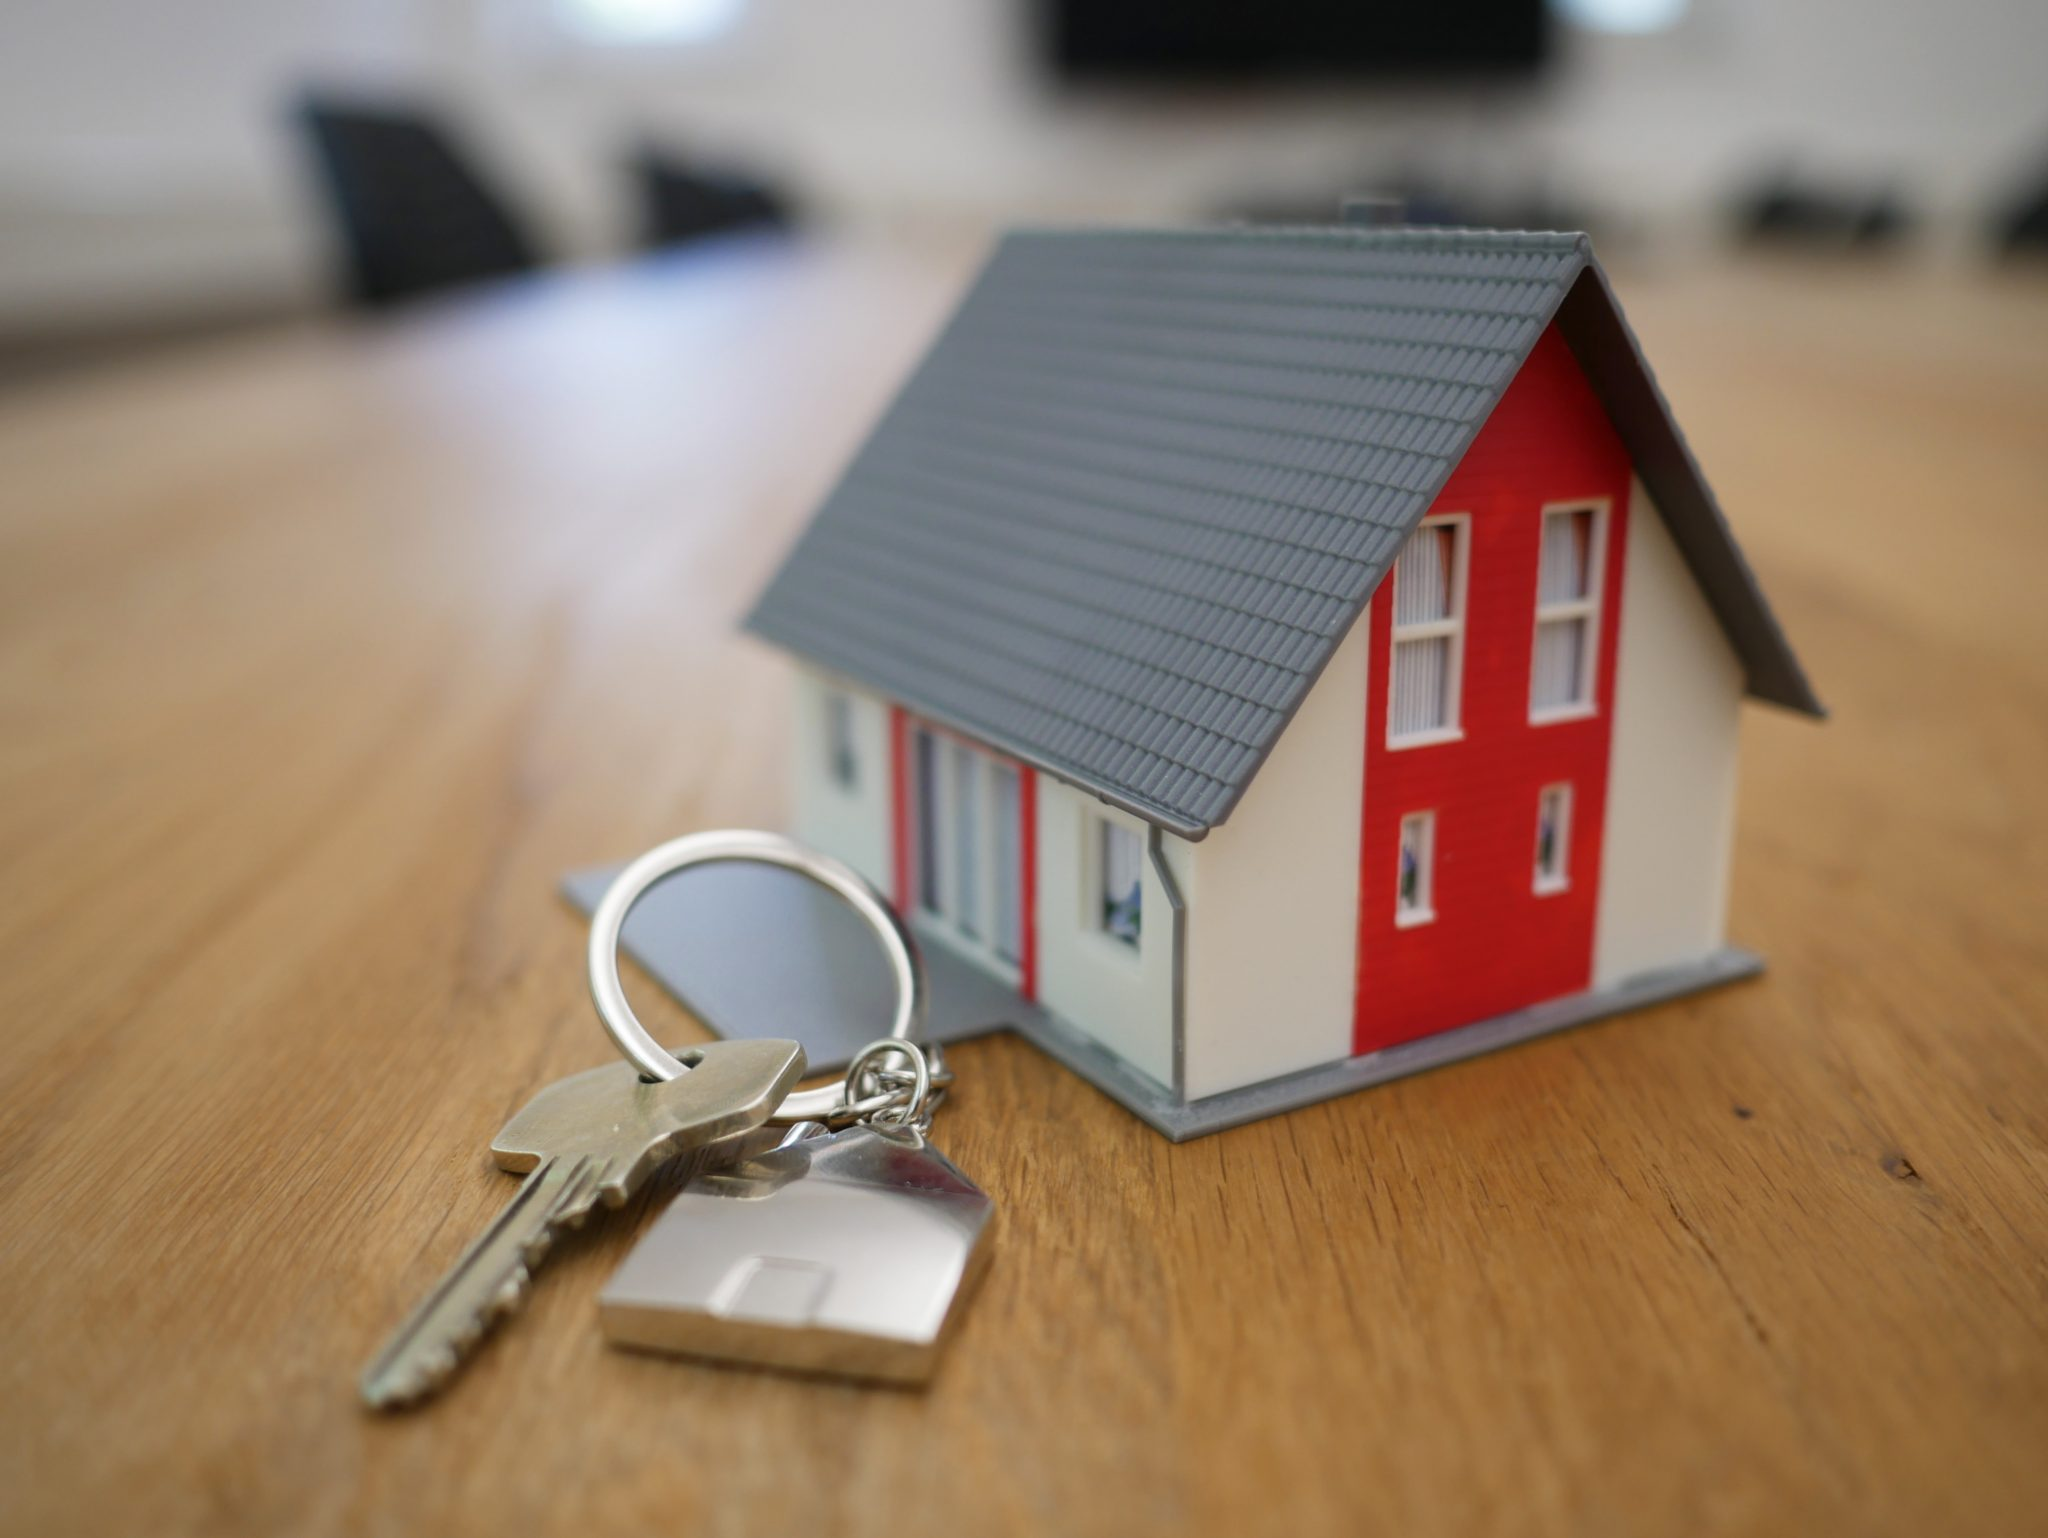 a keychain house with key on a table